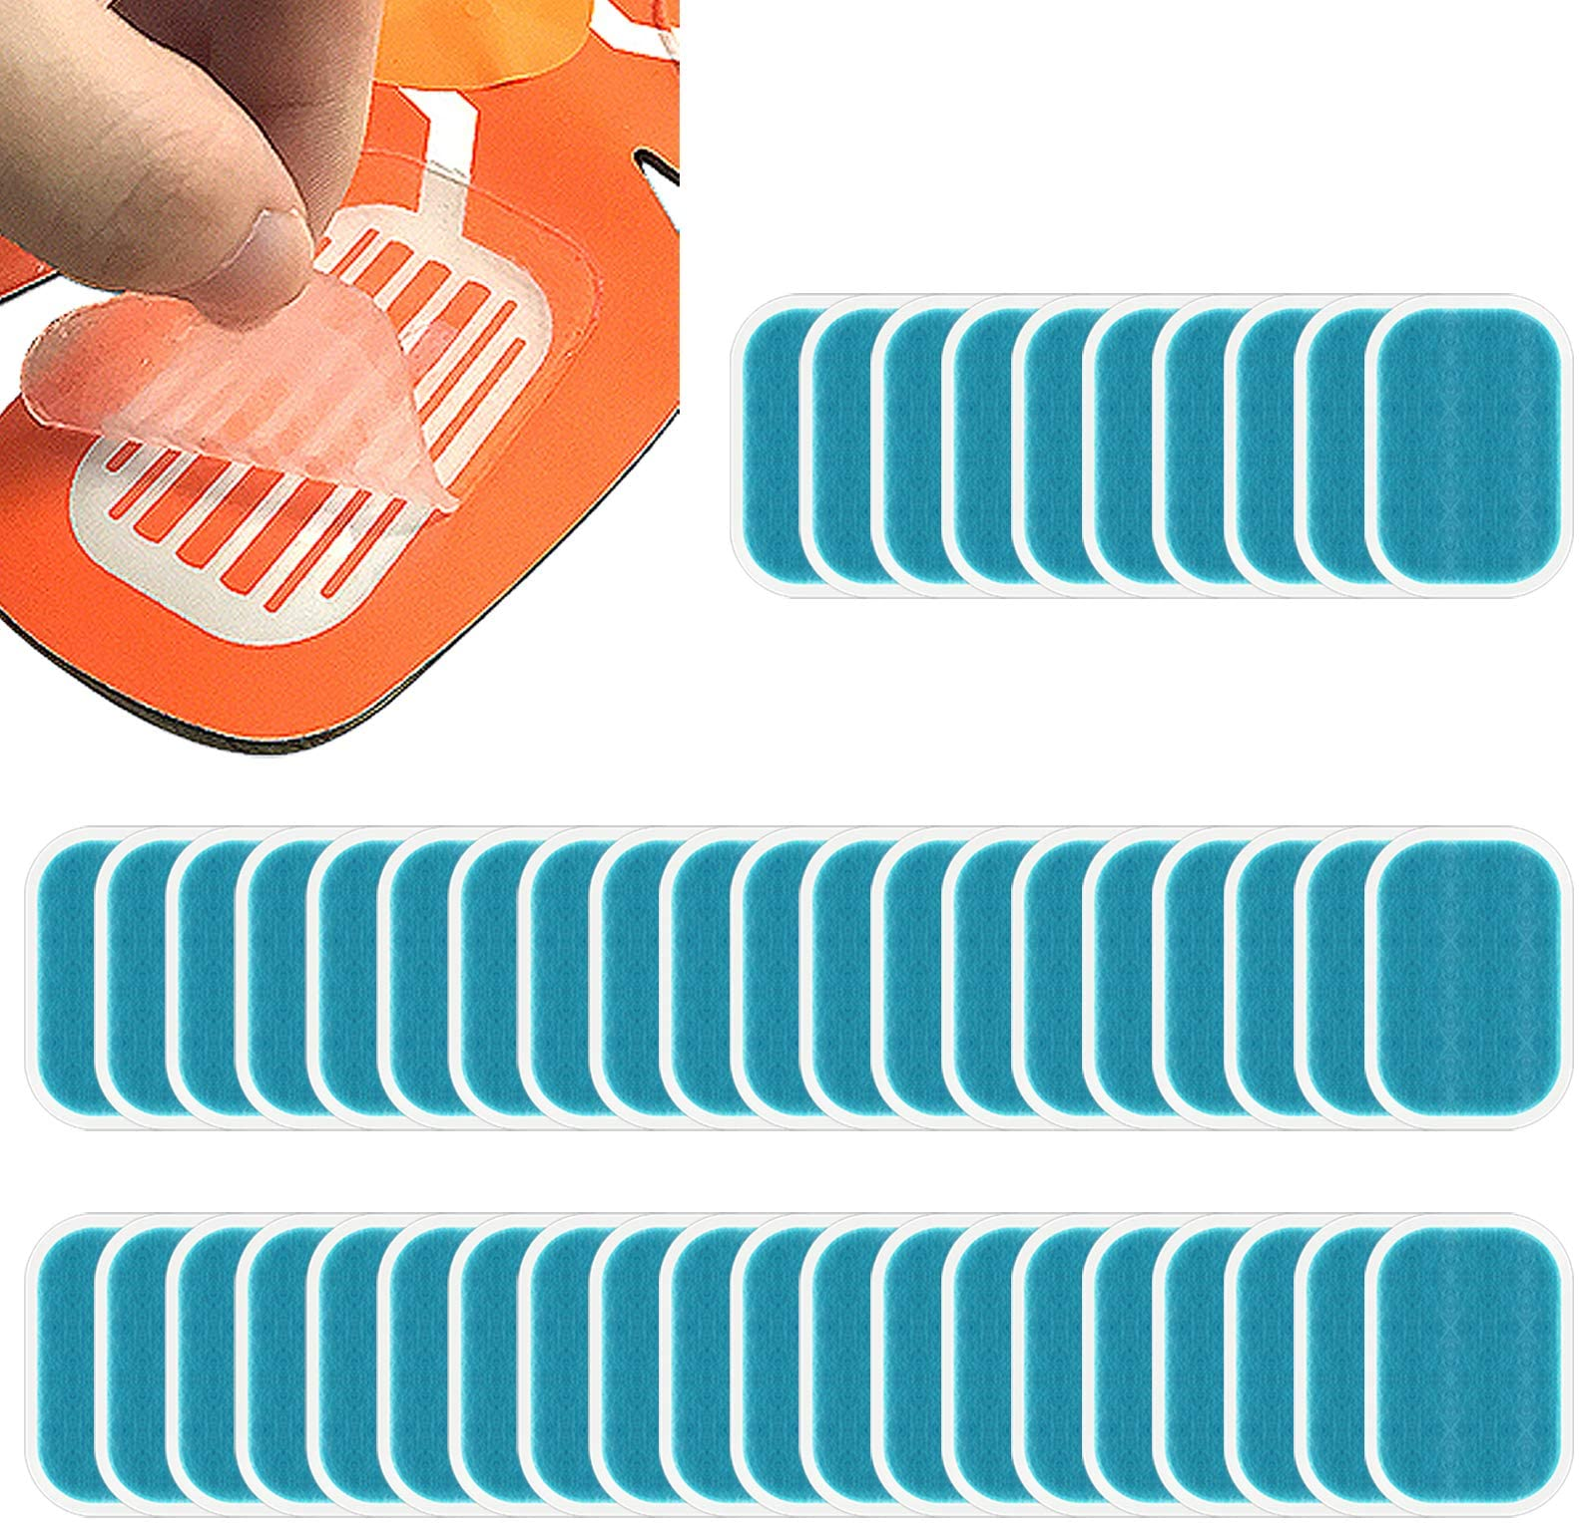 50xHydrogel Adhesive Sheet Pad Fitness Abdominal Muscles Toning Belt 38*56MM